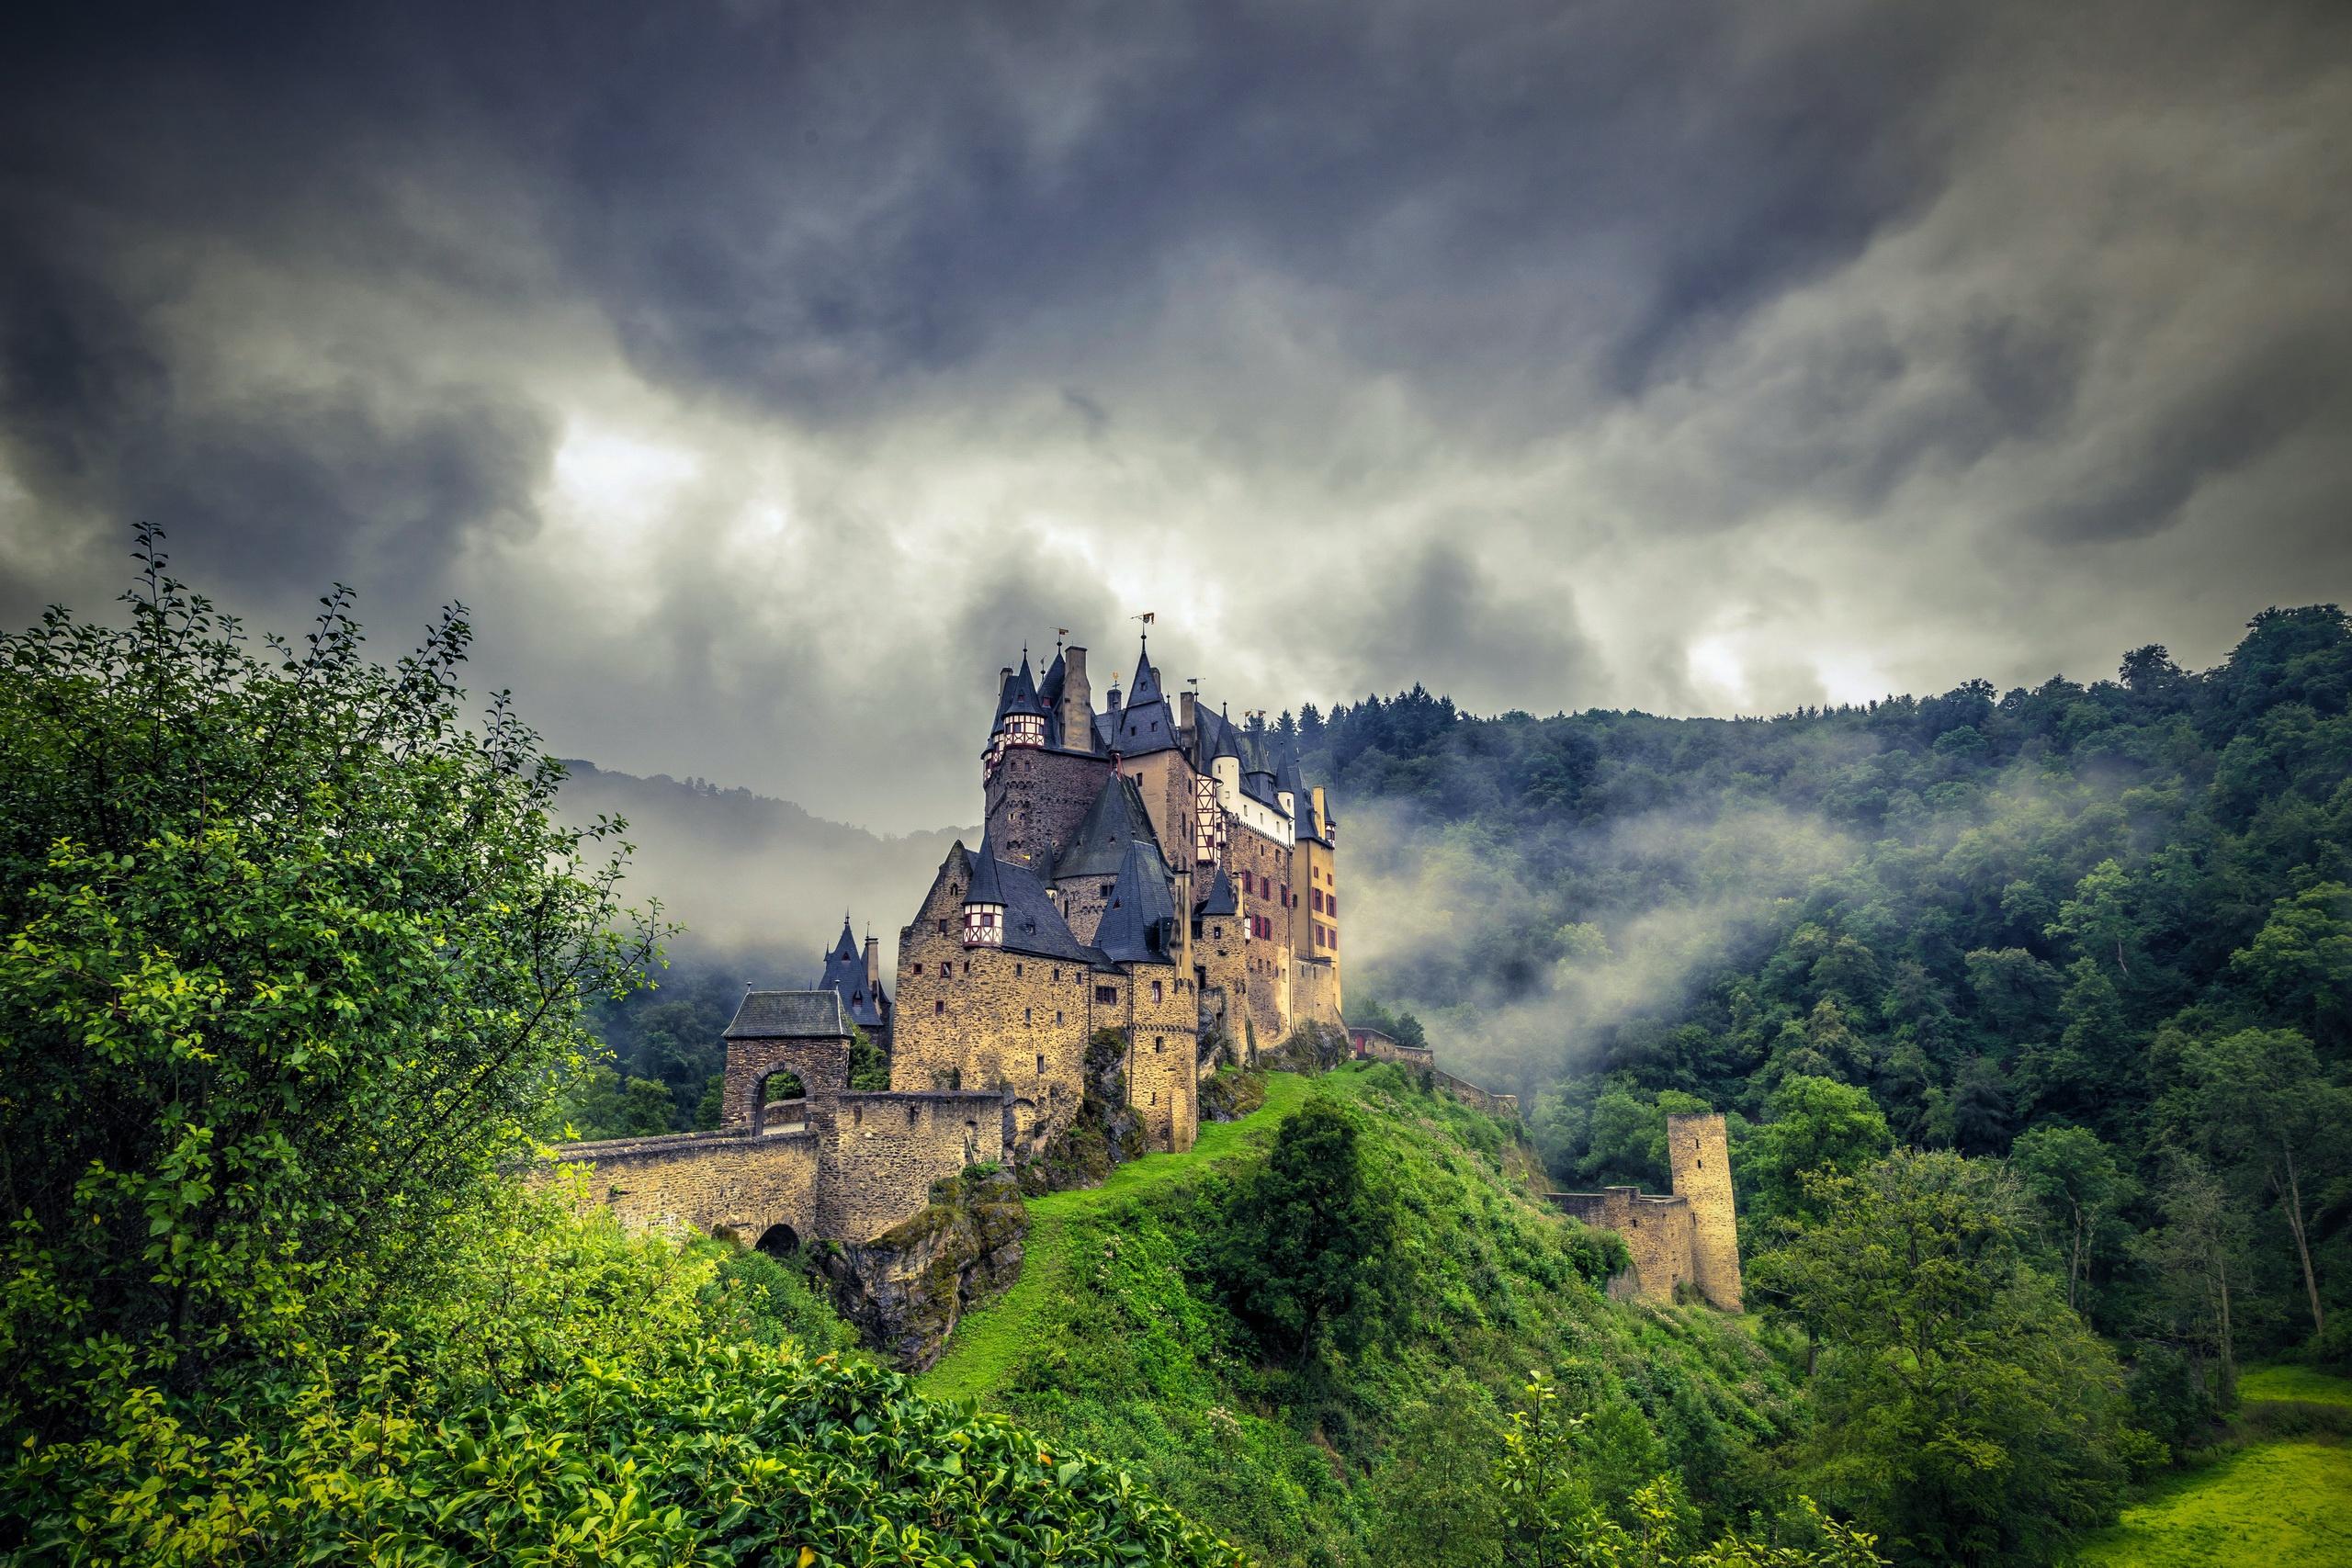 Пейзаж с замком фото